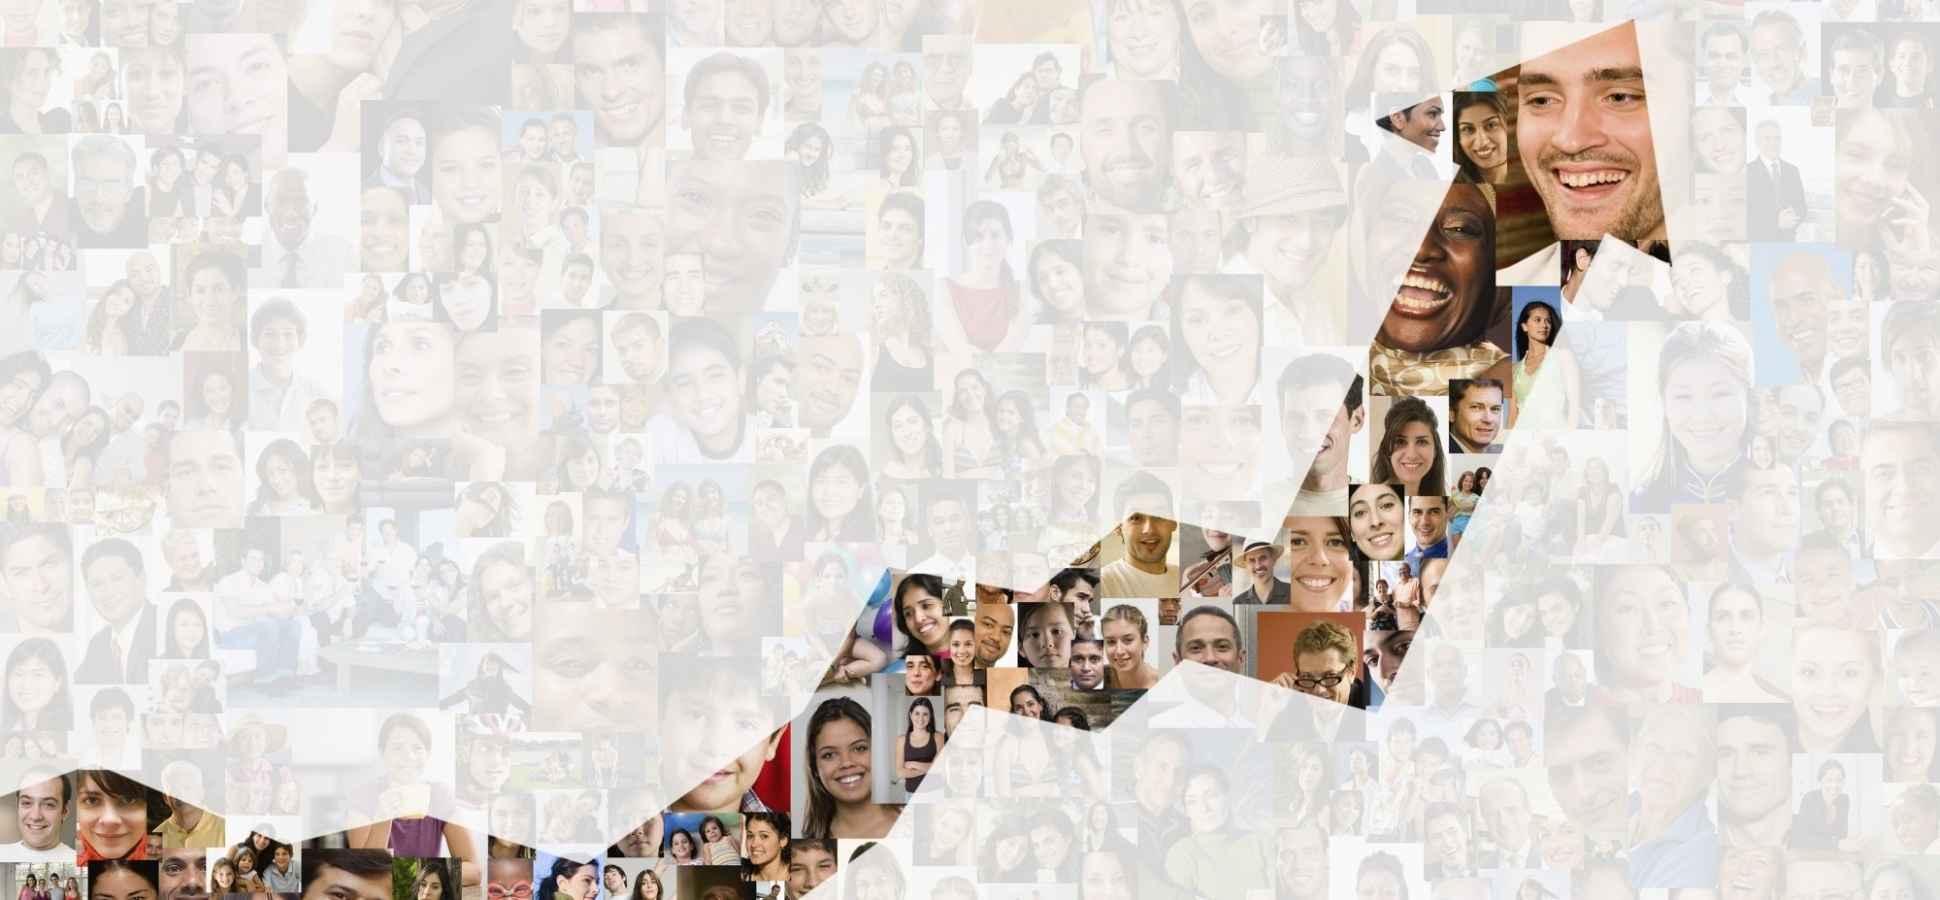 7 Ways to Grow Your Social Media Bottom Line